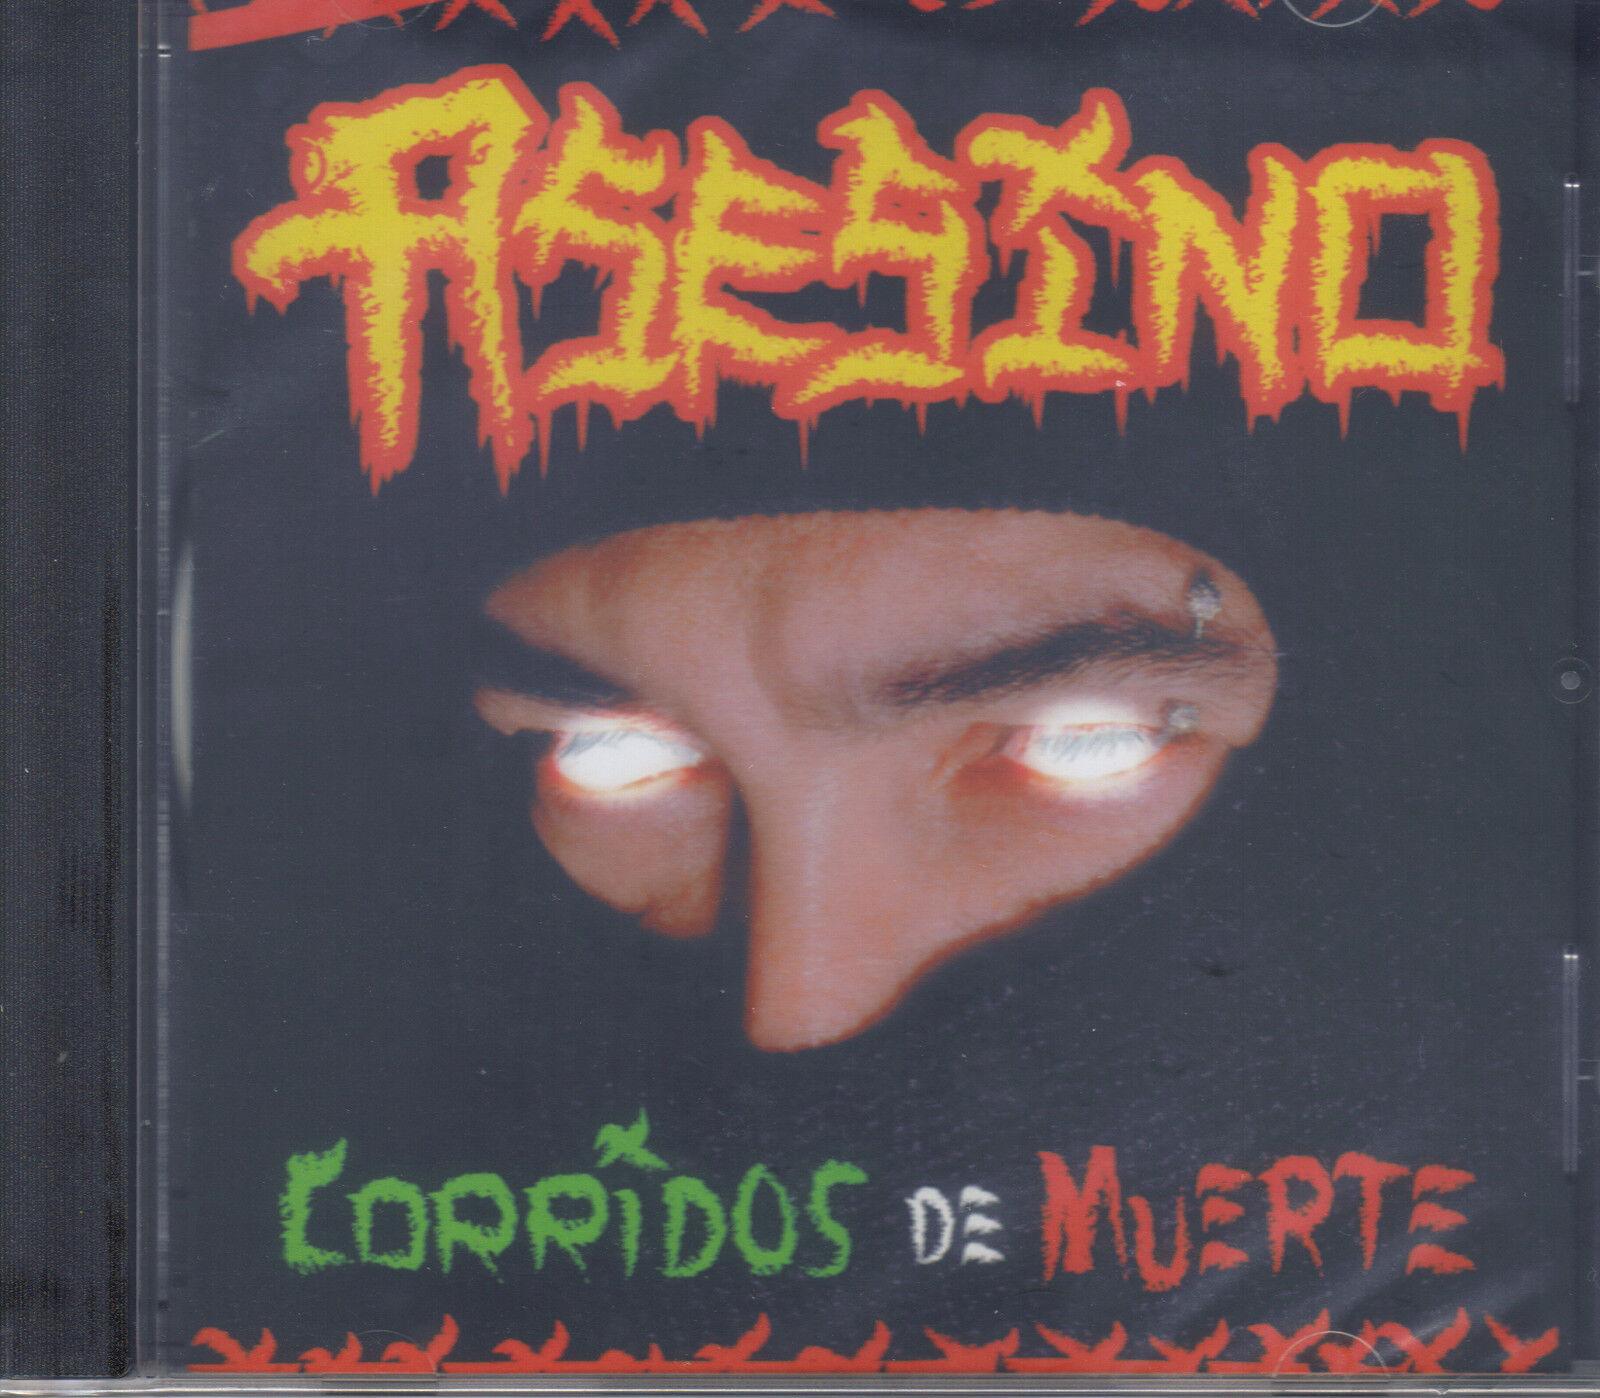 Asesino-corridos De Muerte-cd-re-issue-death-grindcore-brujeria-divine Heresy